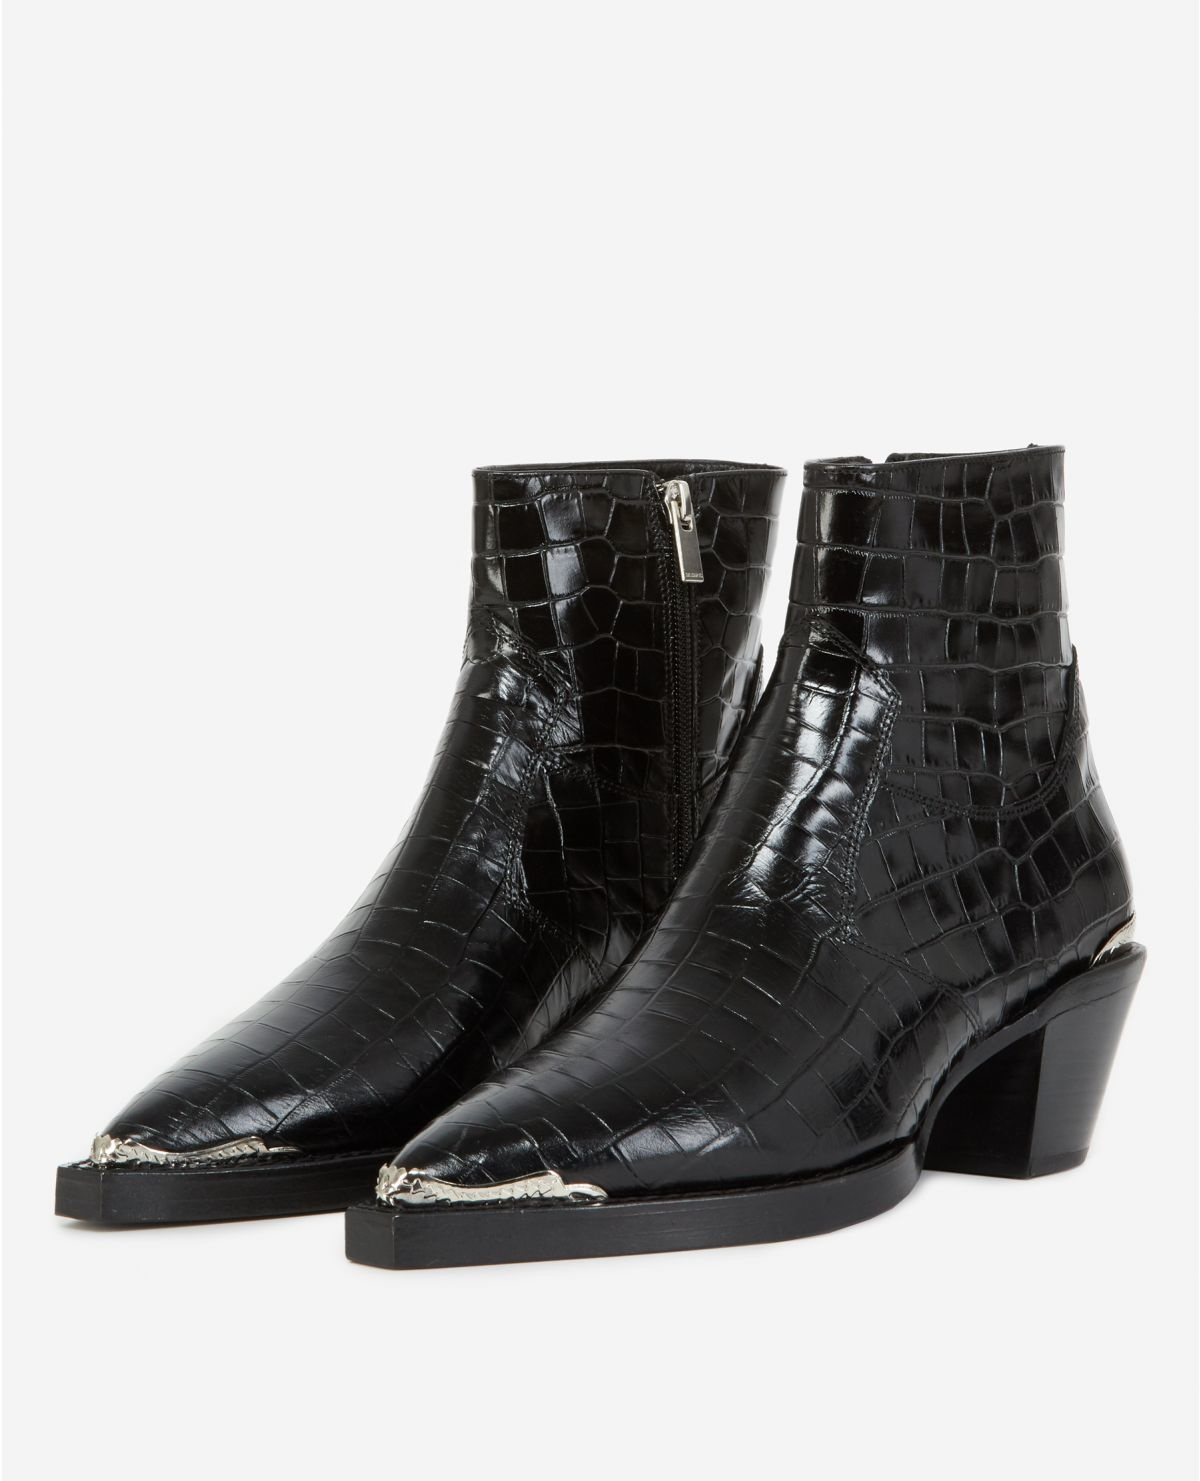 AFCHTHE KOOPLES bottines noires cuir façon croco21055K-1